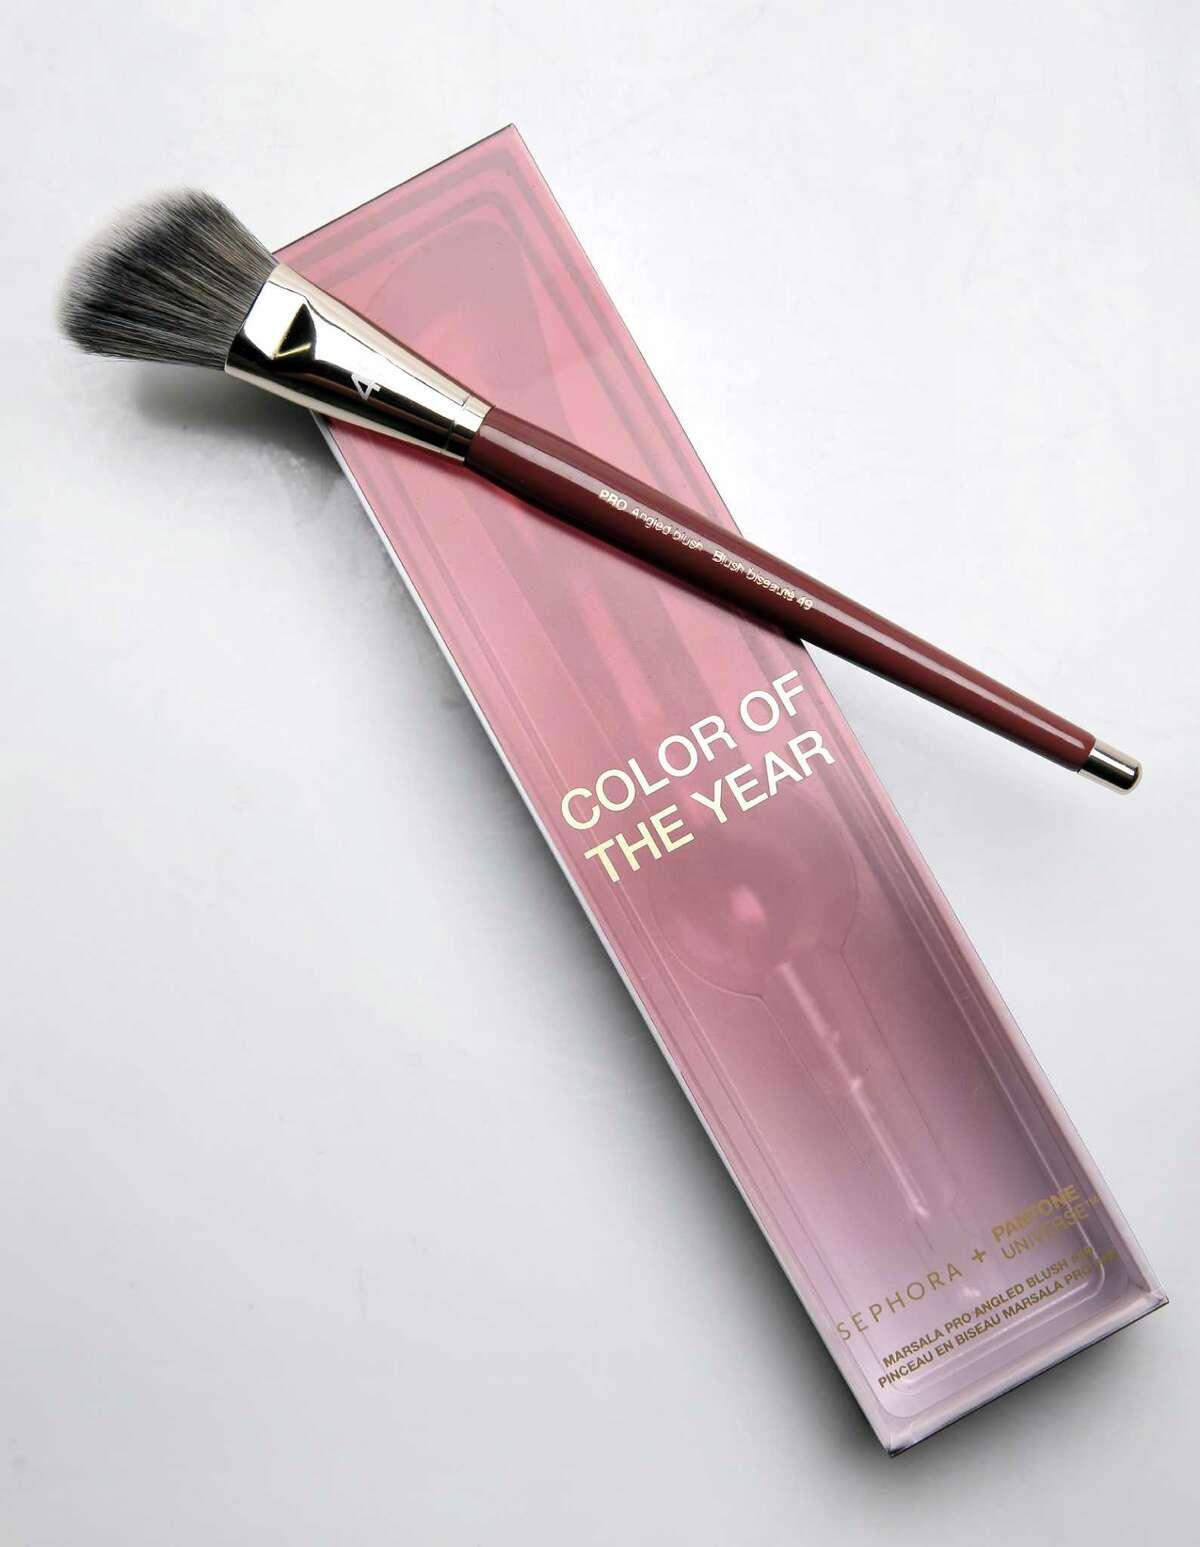 Sephora cosmetics Marsala Pro Angled Blush Brush #49 based on Pantone's Color of the Year.